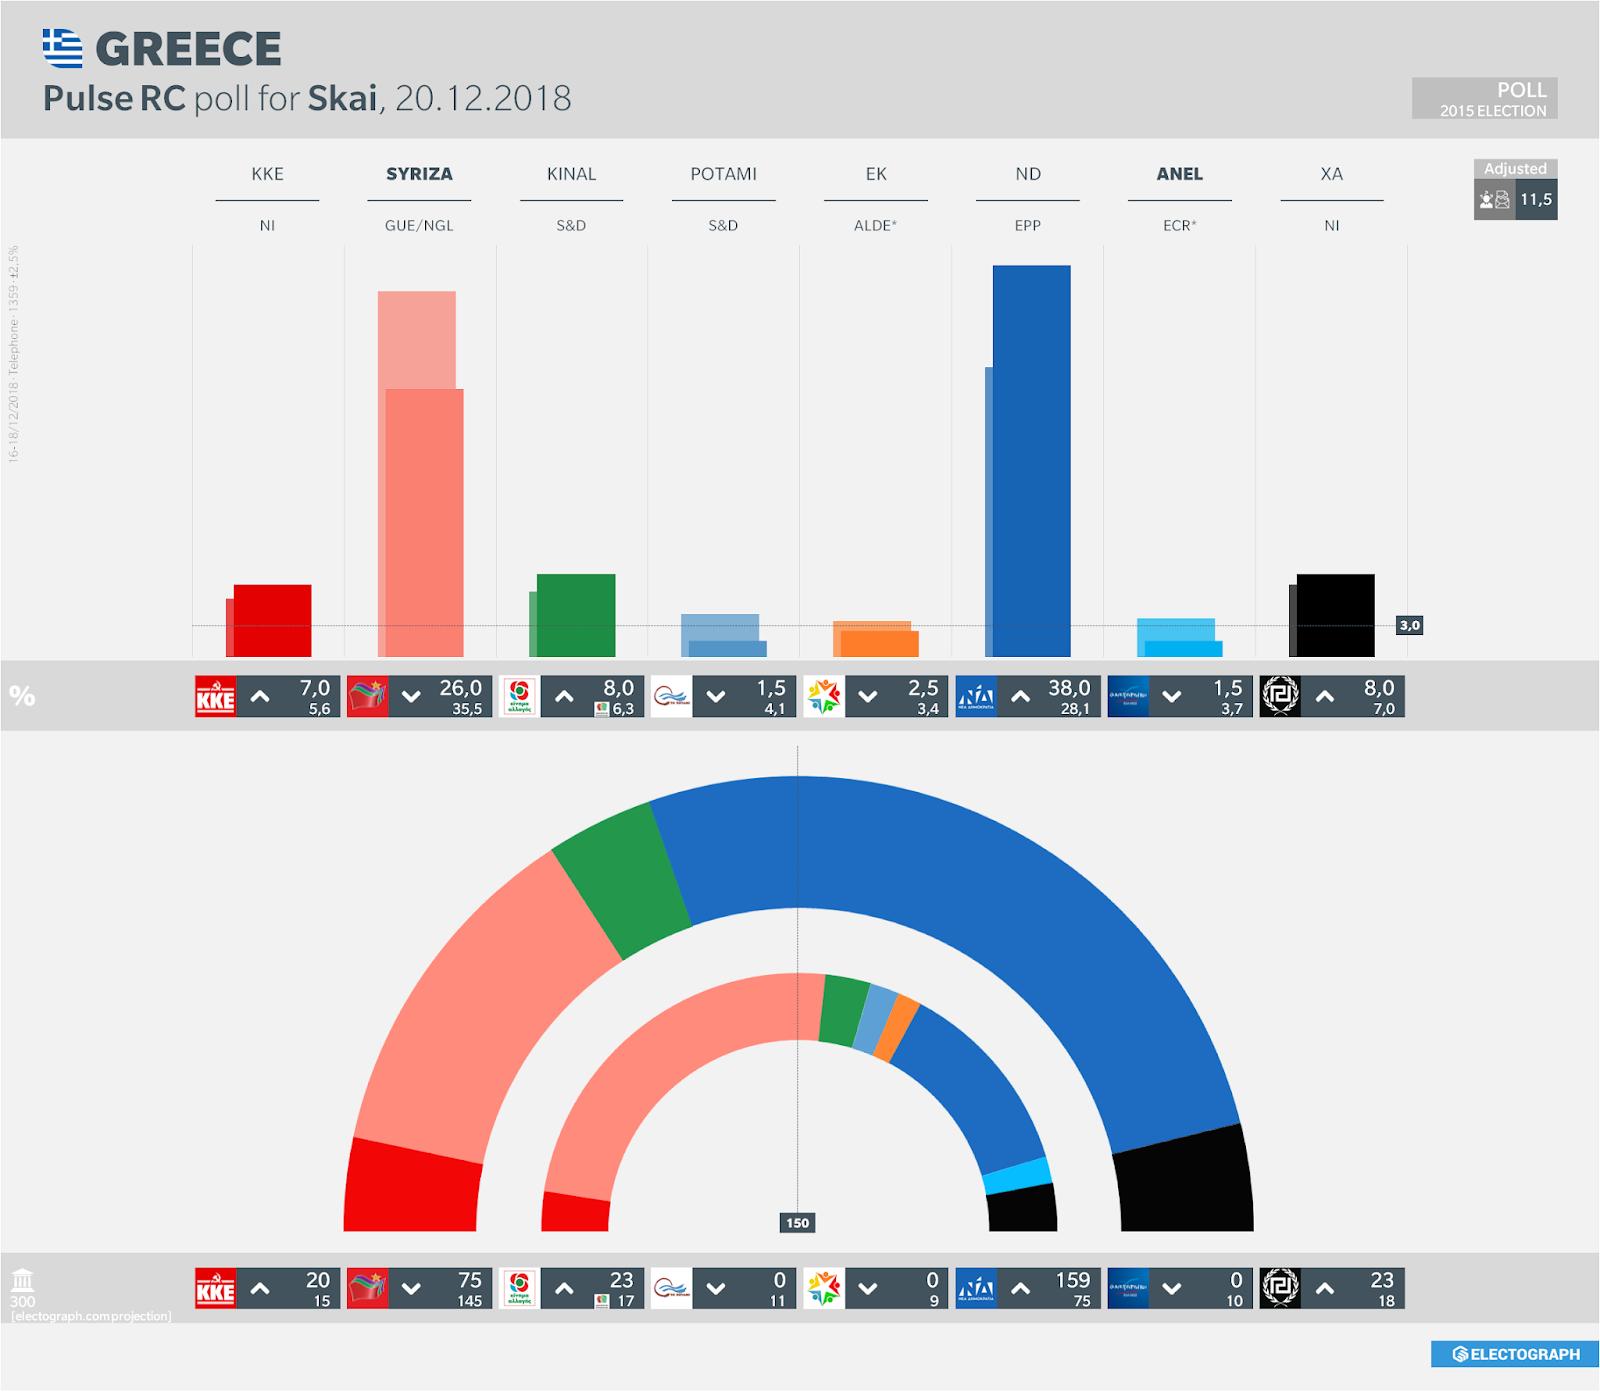 GREECE: Pulse RC poll chart for SKAI, 20 December 2018